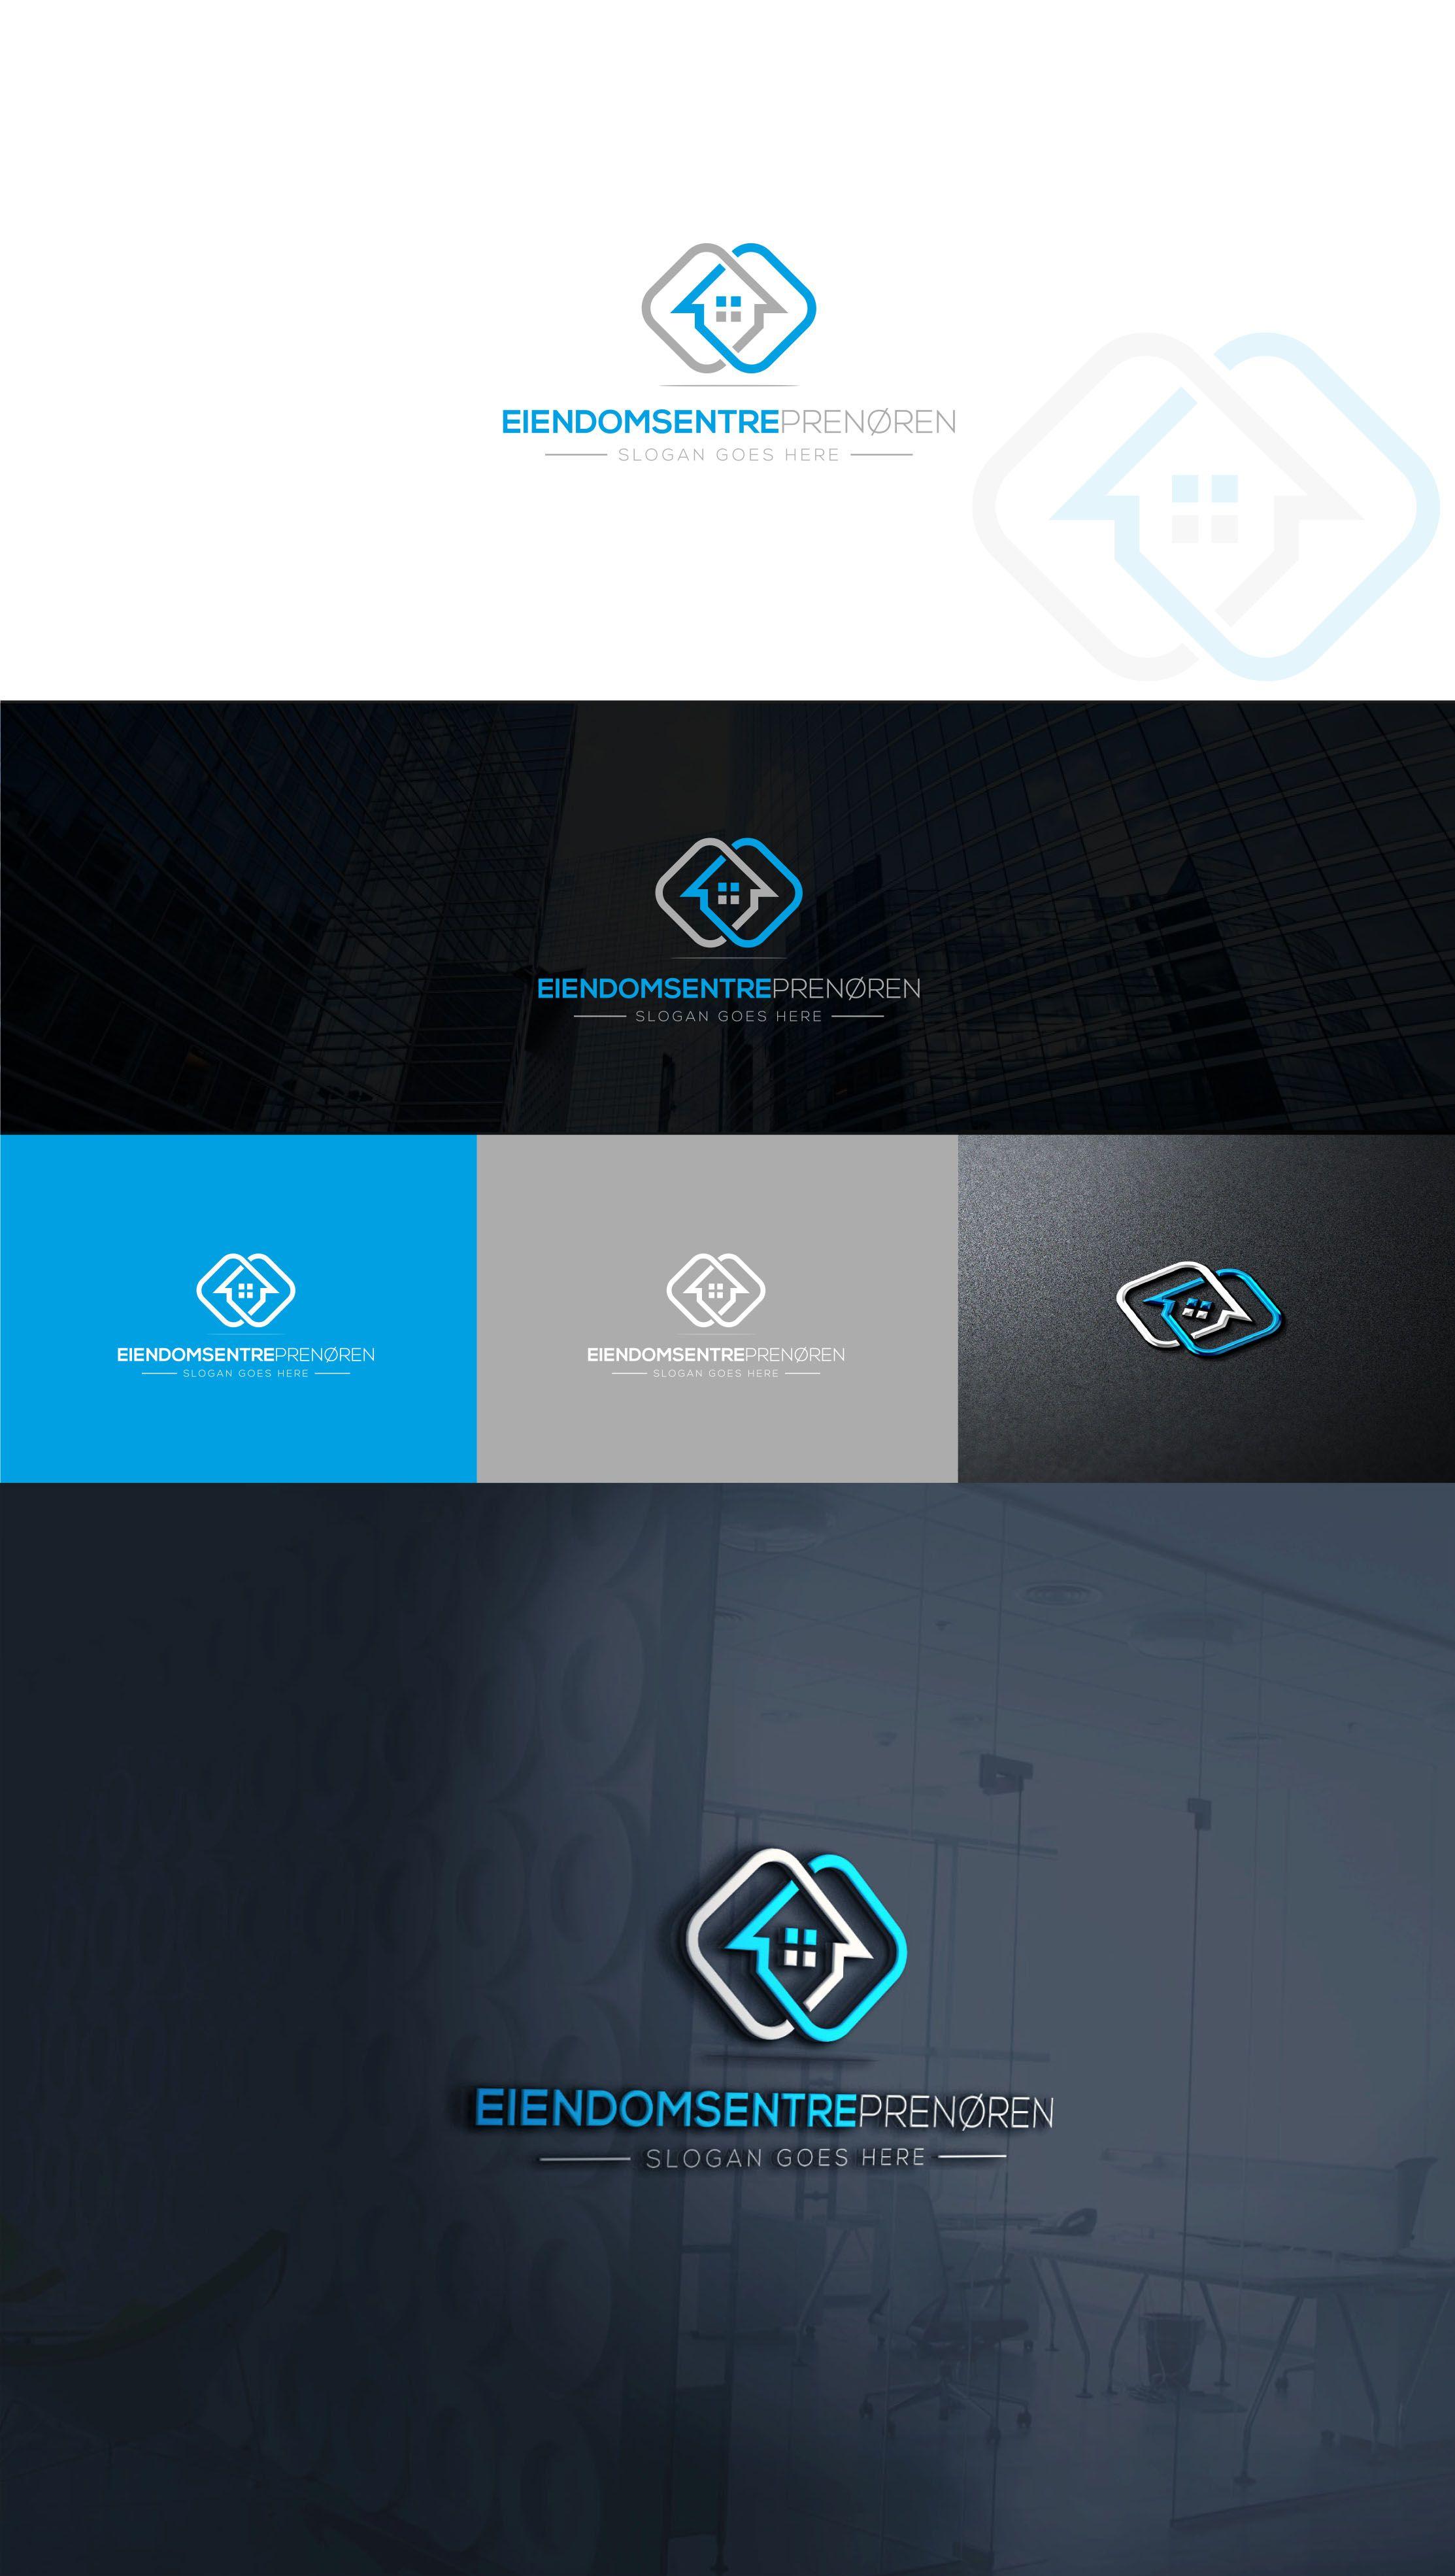 logo design templates logo design and download logo